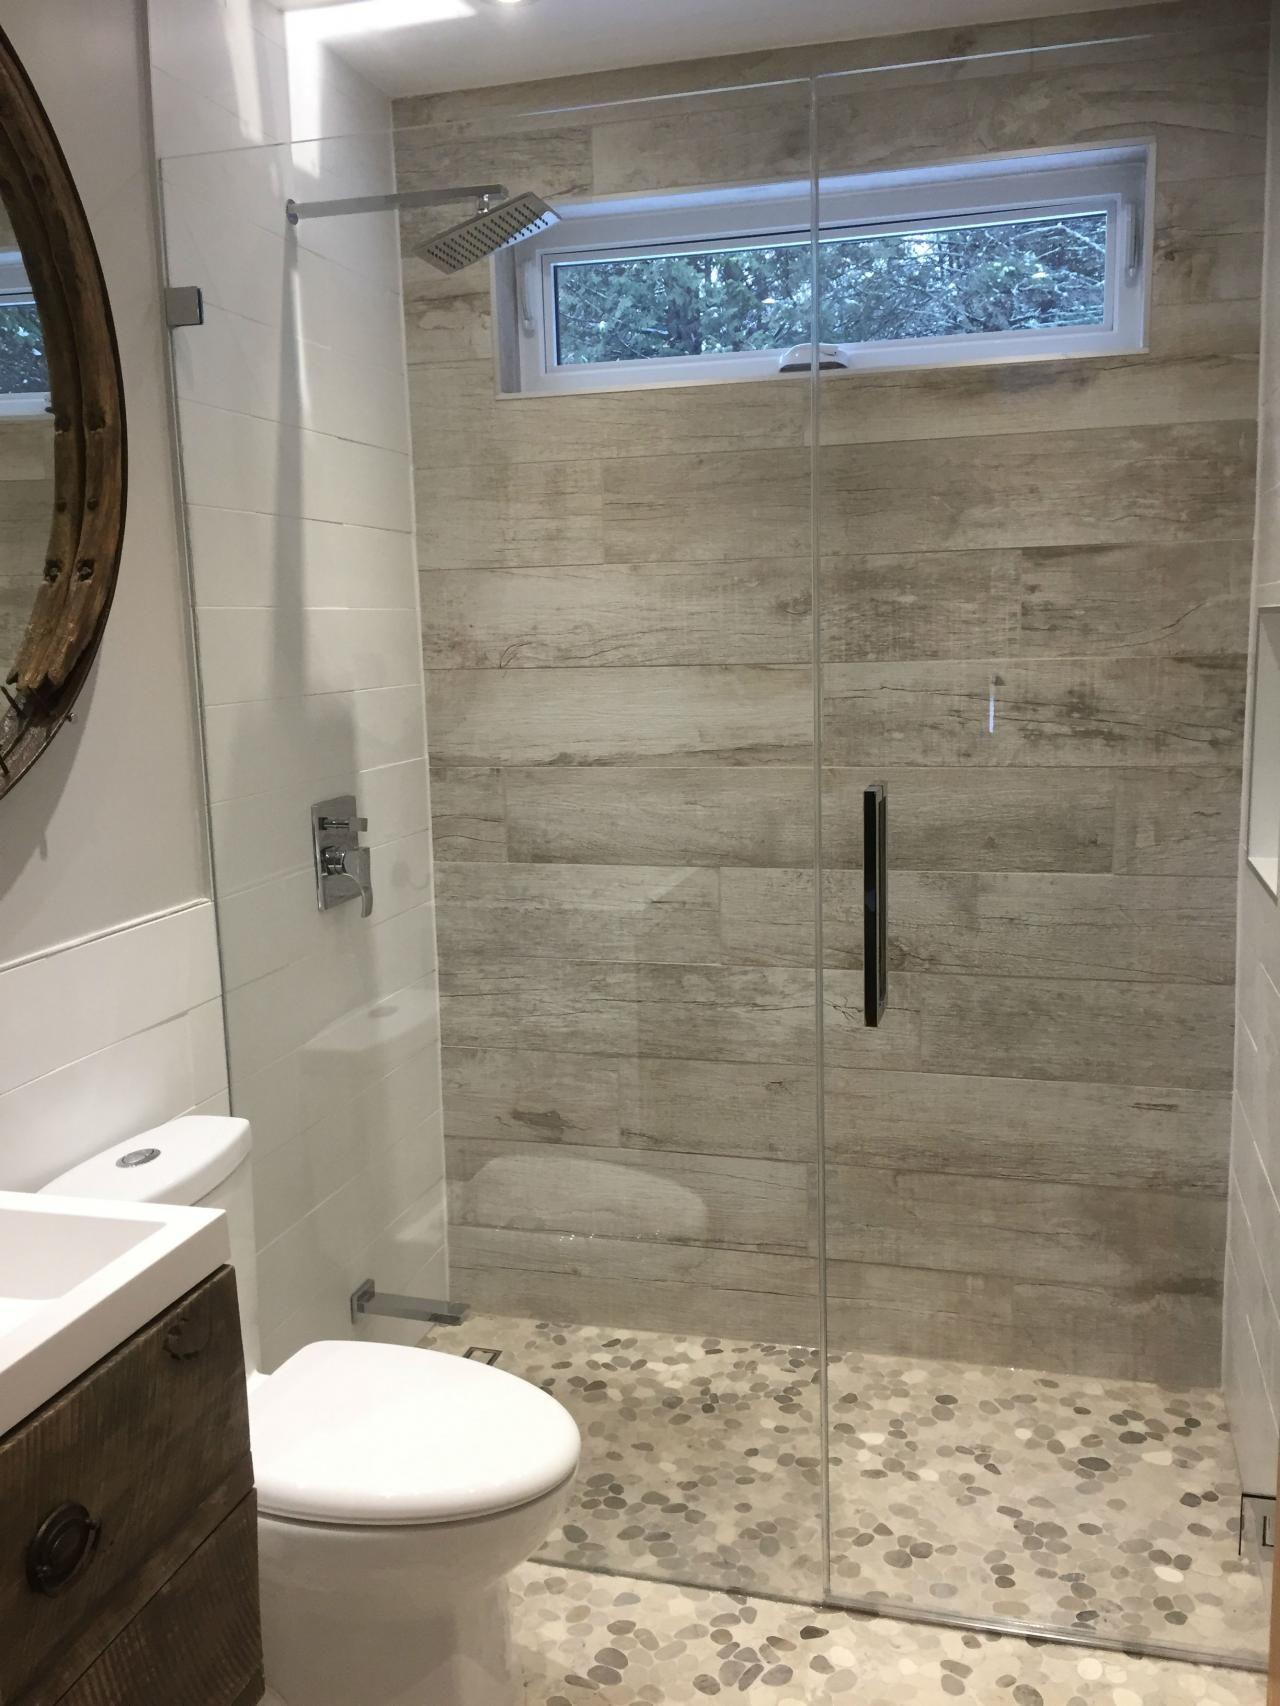 Top Notch Renos Cottage Bathroom With Barn Board Tile Wall Mosaic Pebble Tile Heated Floor Glas Bathrooms Remodel Small Bathroom With Shower Bathroom Renos